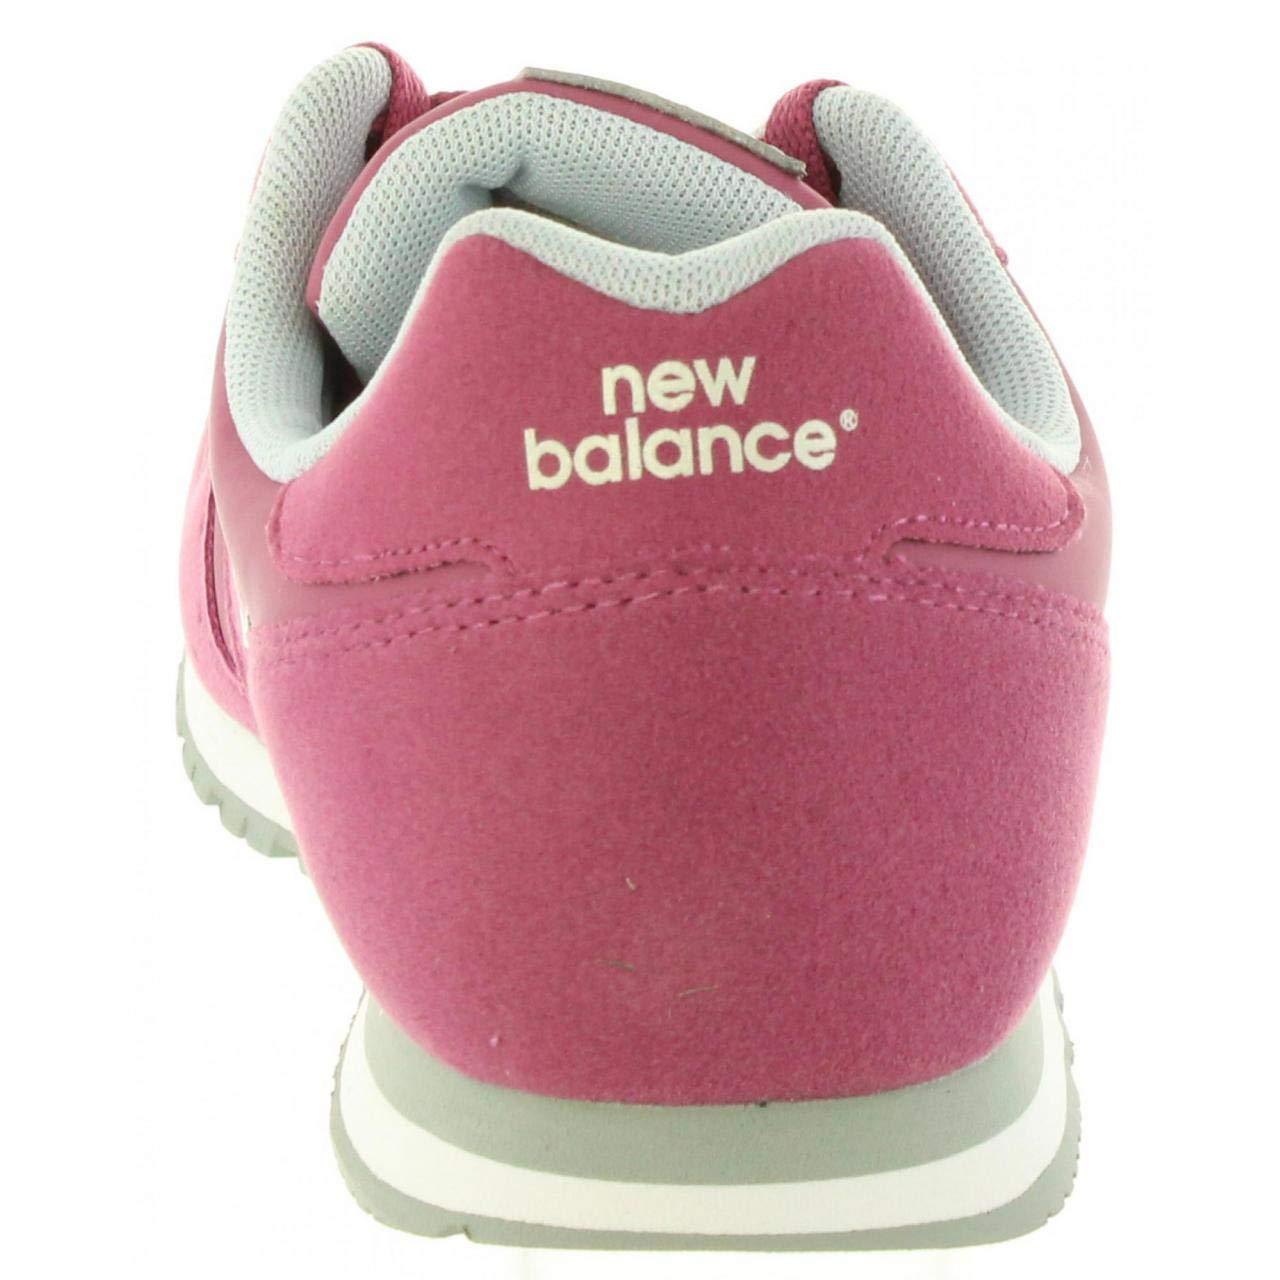 New Balance Damen Hausschuhe Kj373 Kj373 Kj373 Pfy Fucsia Fitnessschuhe 102ae8